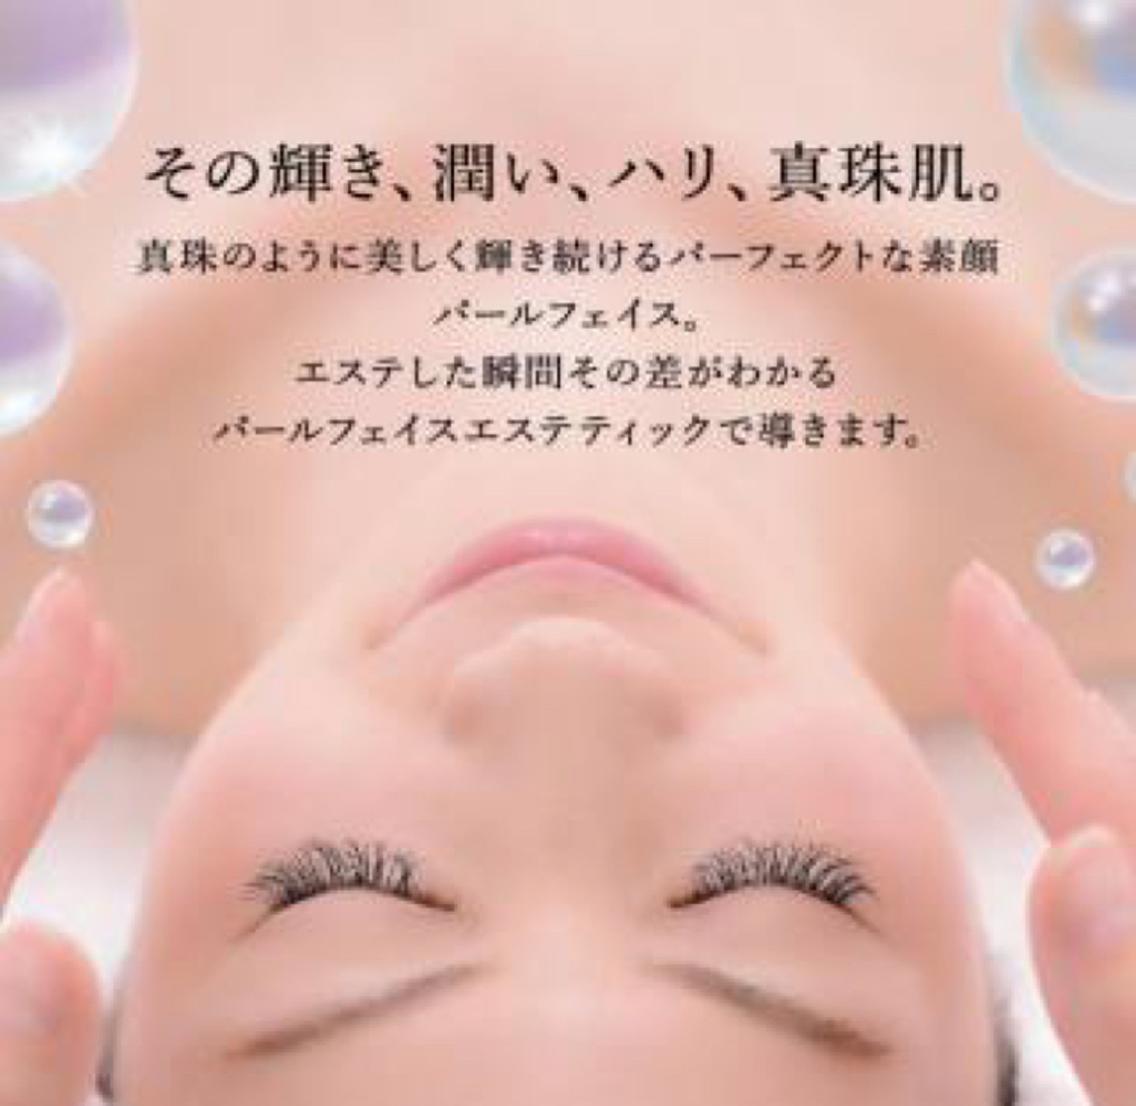 "pearl face esthe""salondekouki""所属・salonkoukiの掲載"